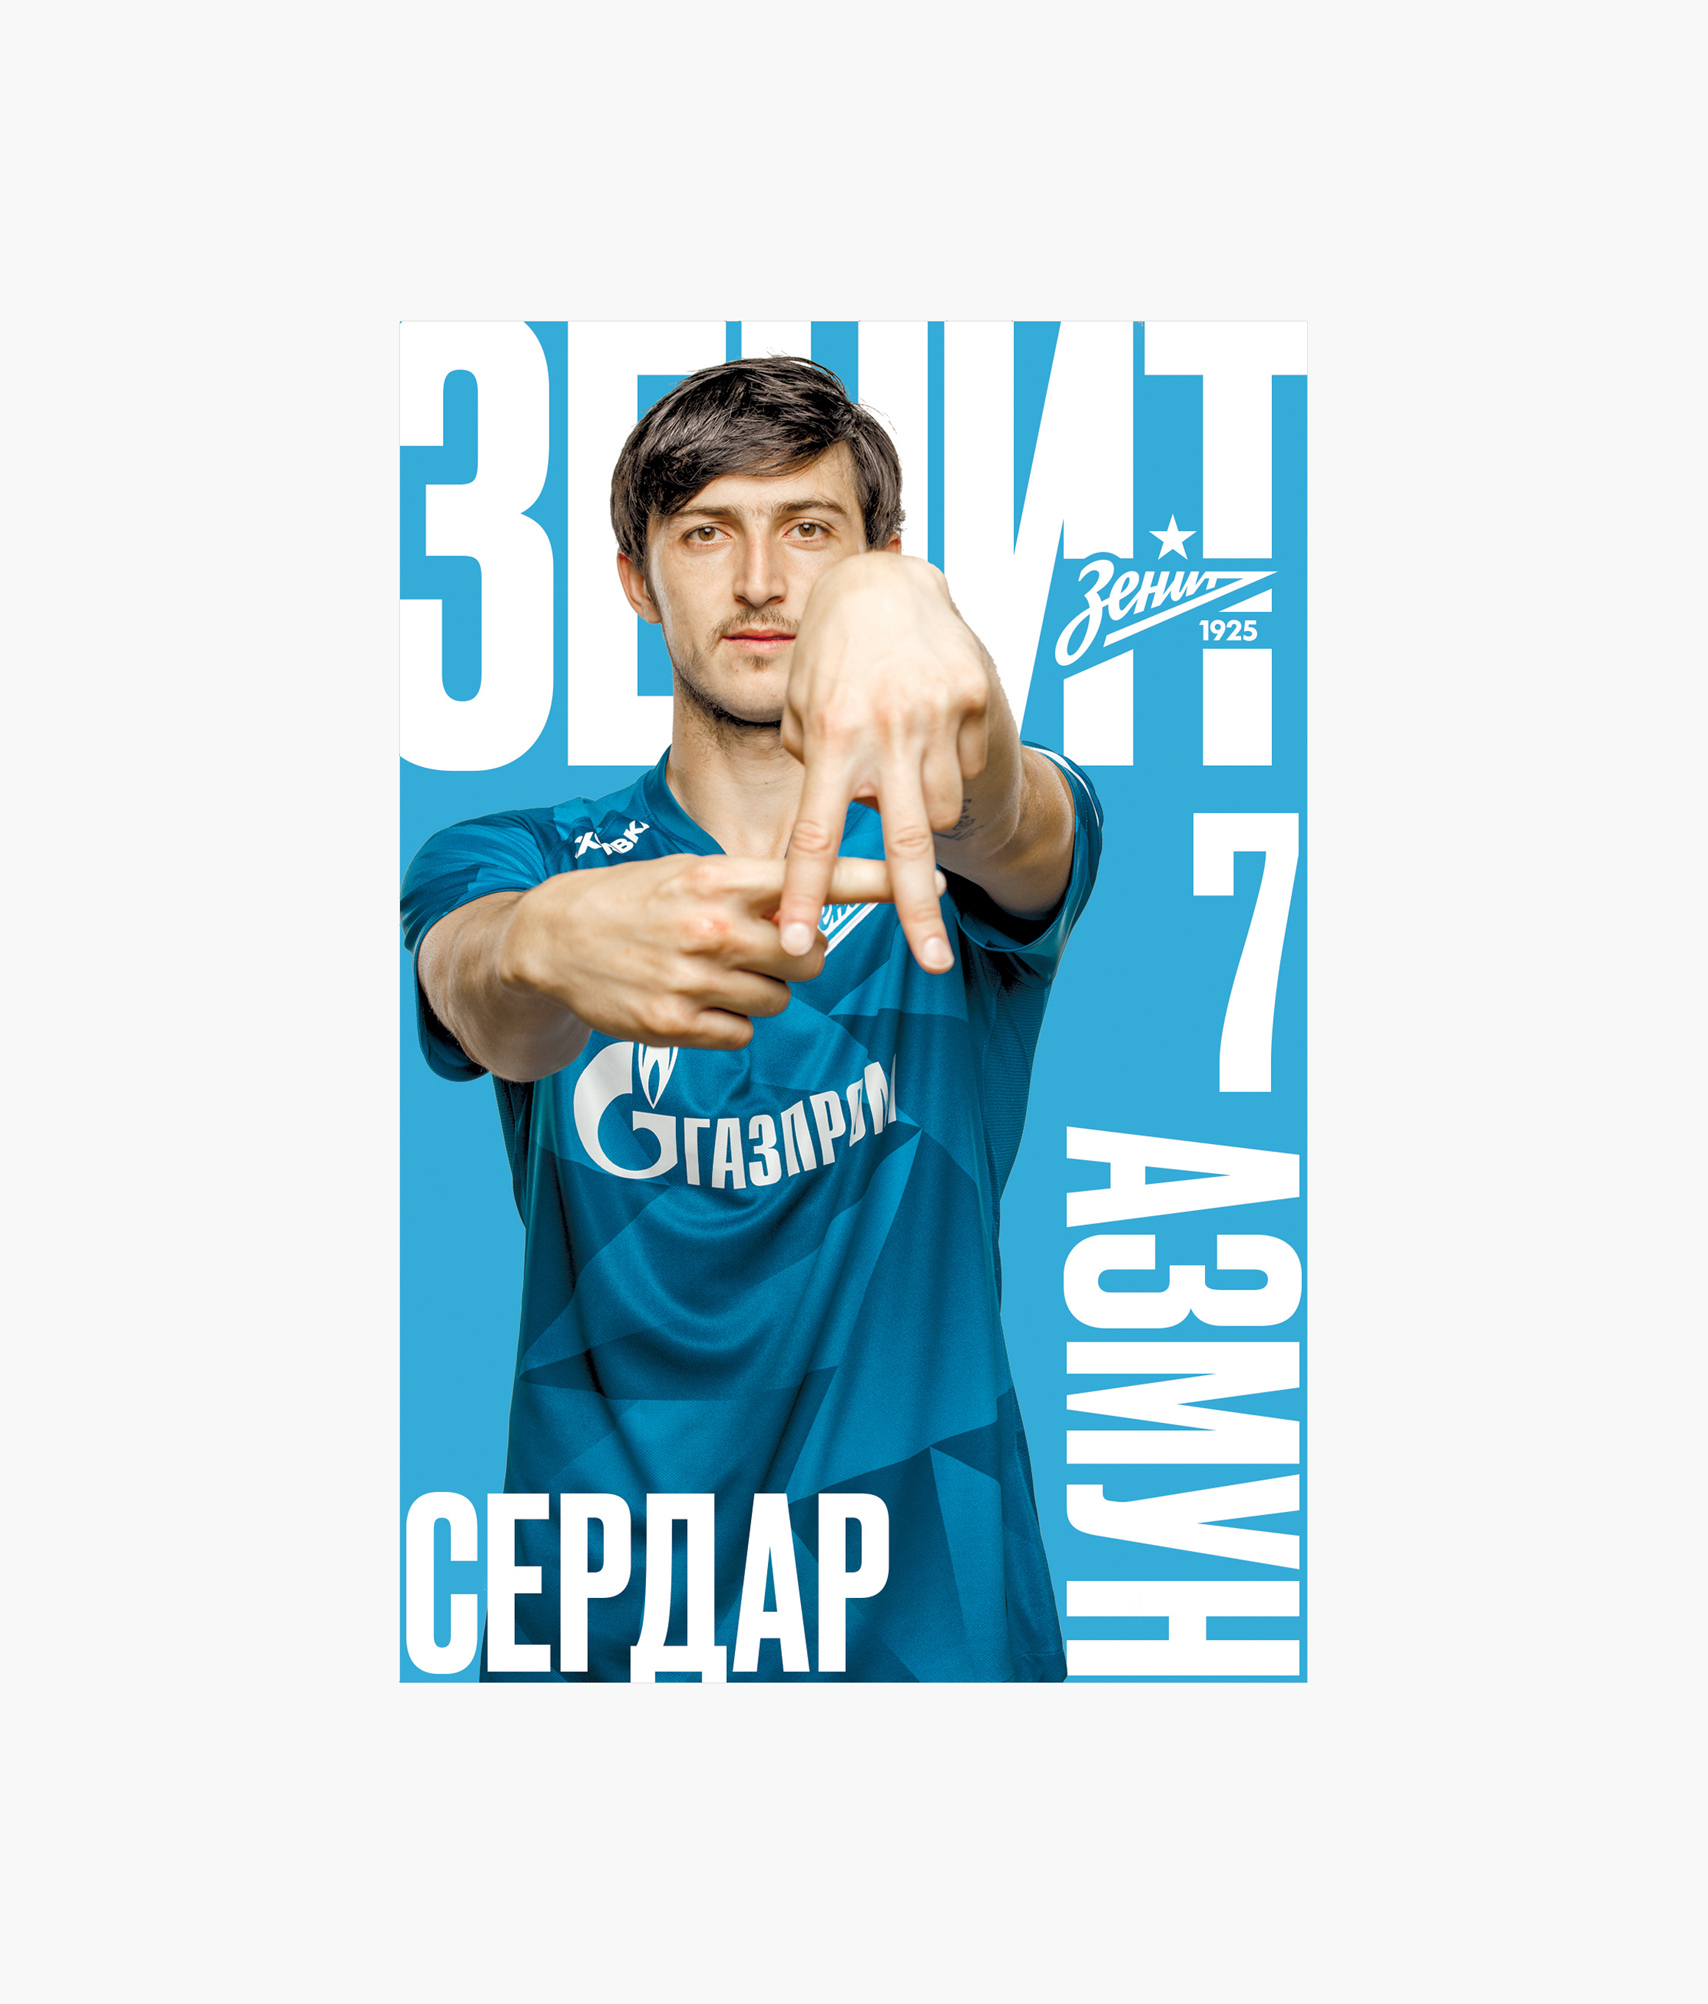 Открытка «Азмун 2019/2020» Зенит